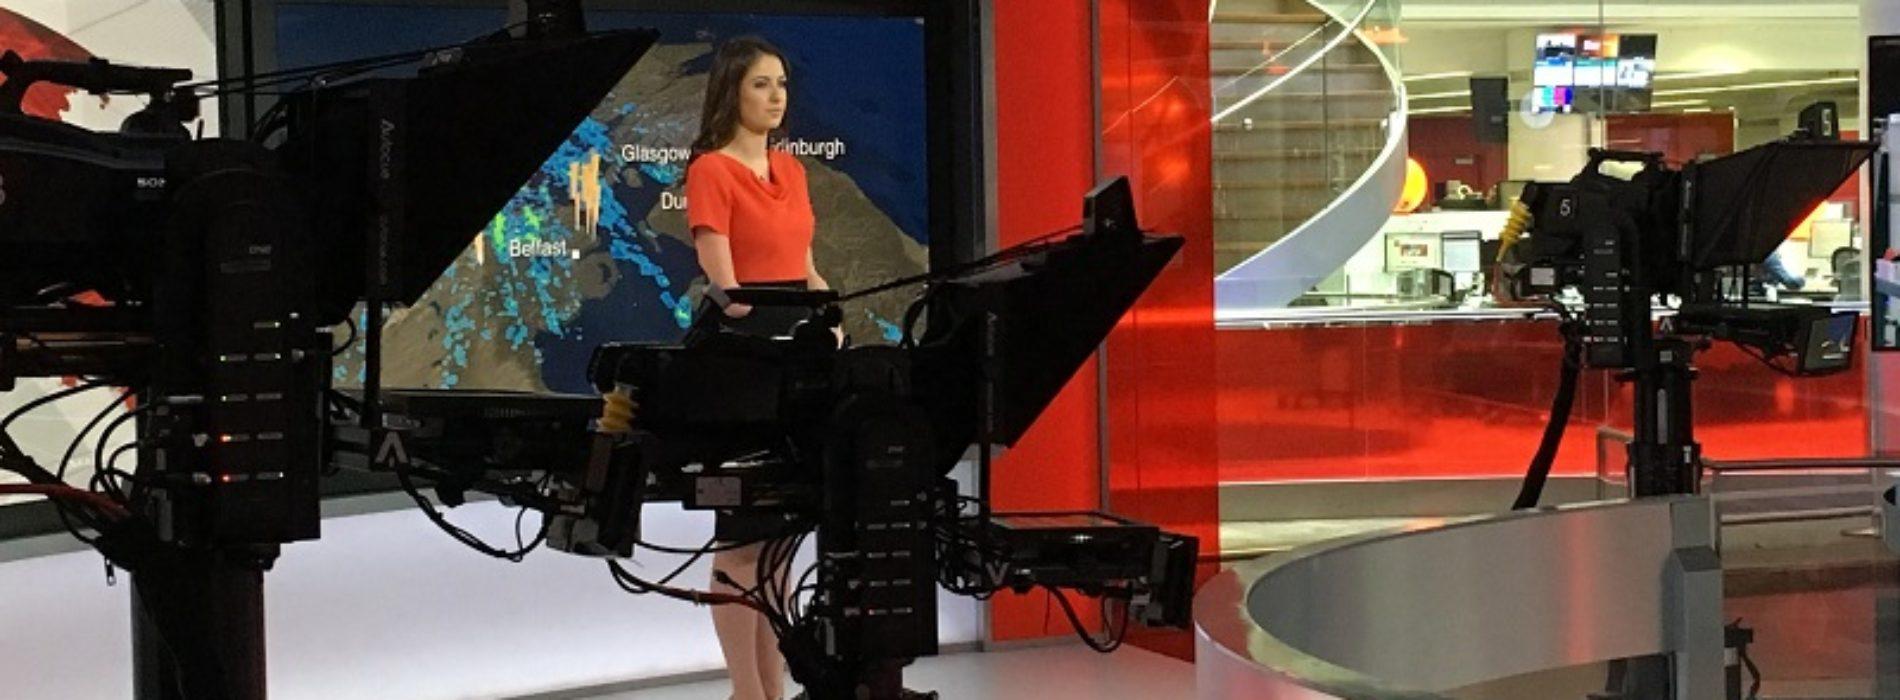 We speak to disabled BBC weather presenter Lucy Martin